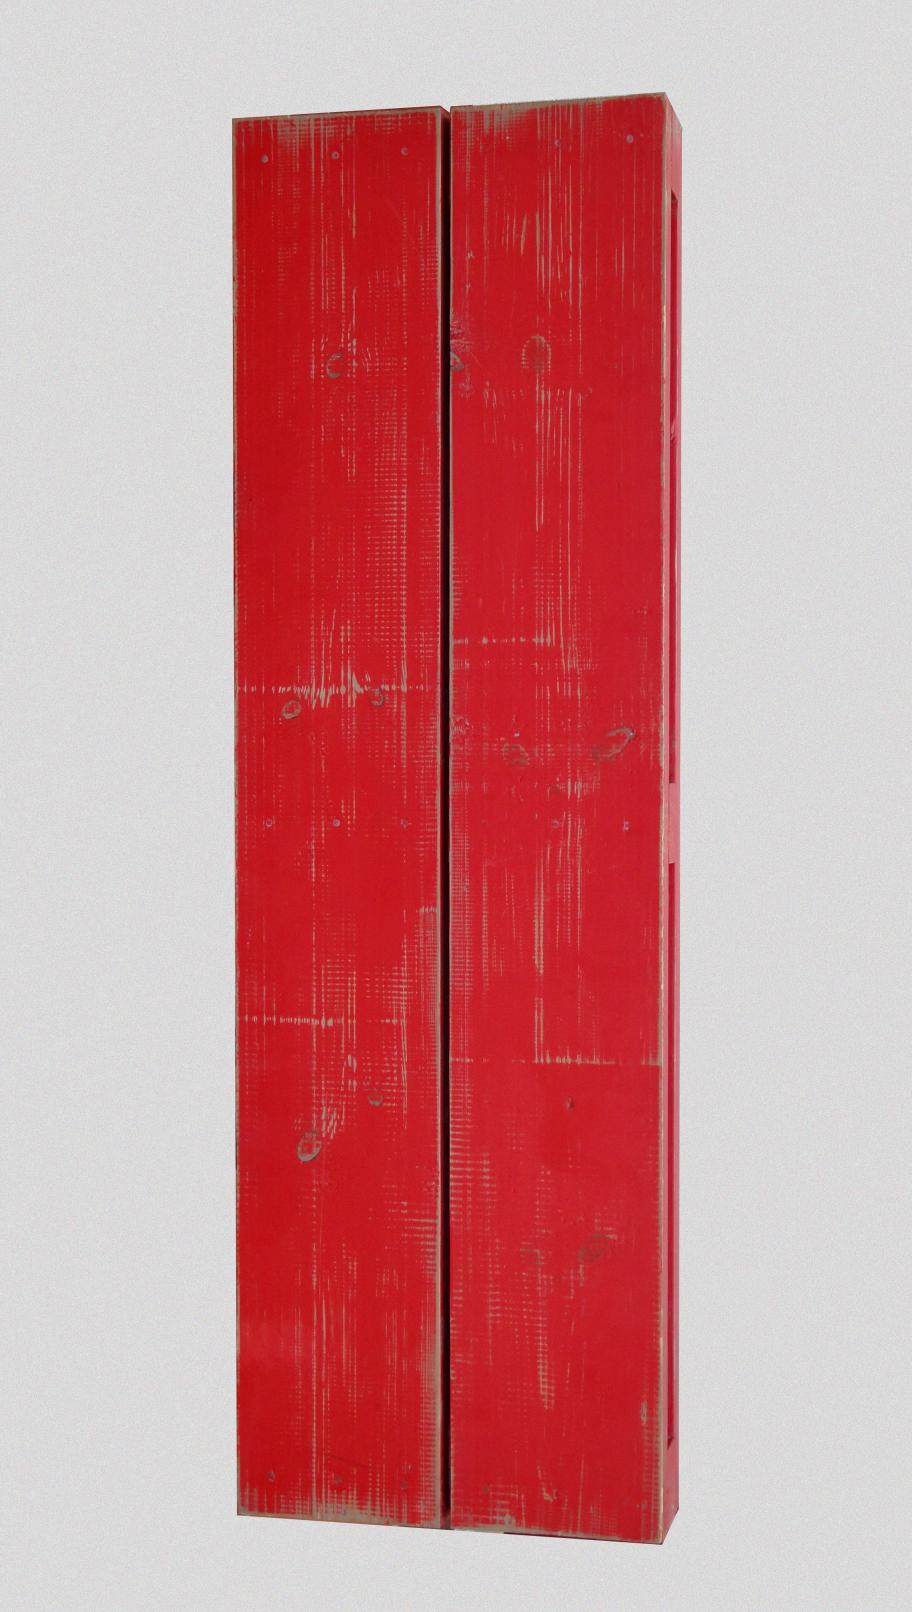 Madera pintada 11. .   120 x 38 x 10 cm. (1983) - Guillermo Lledó